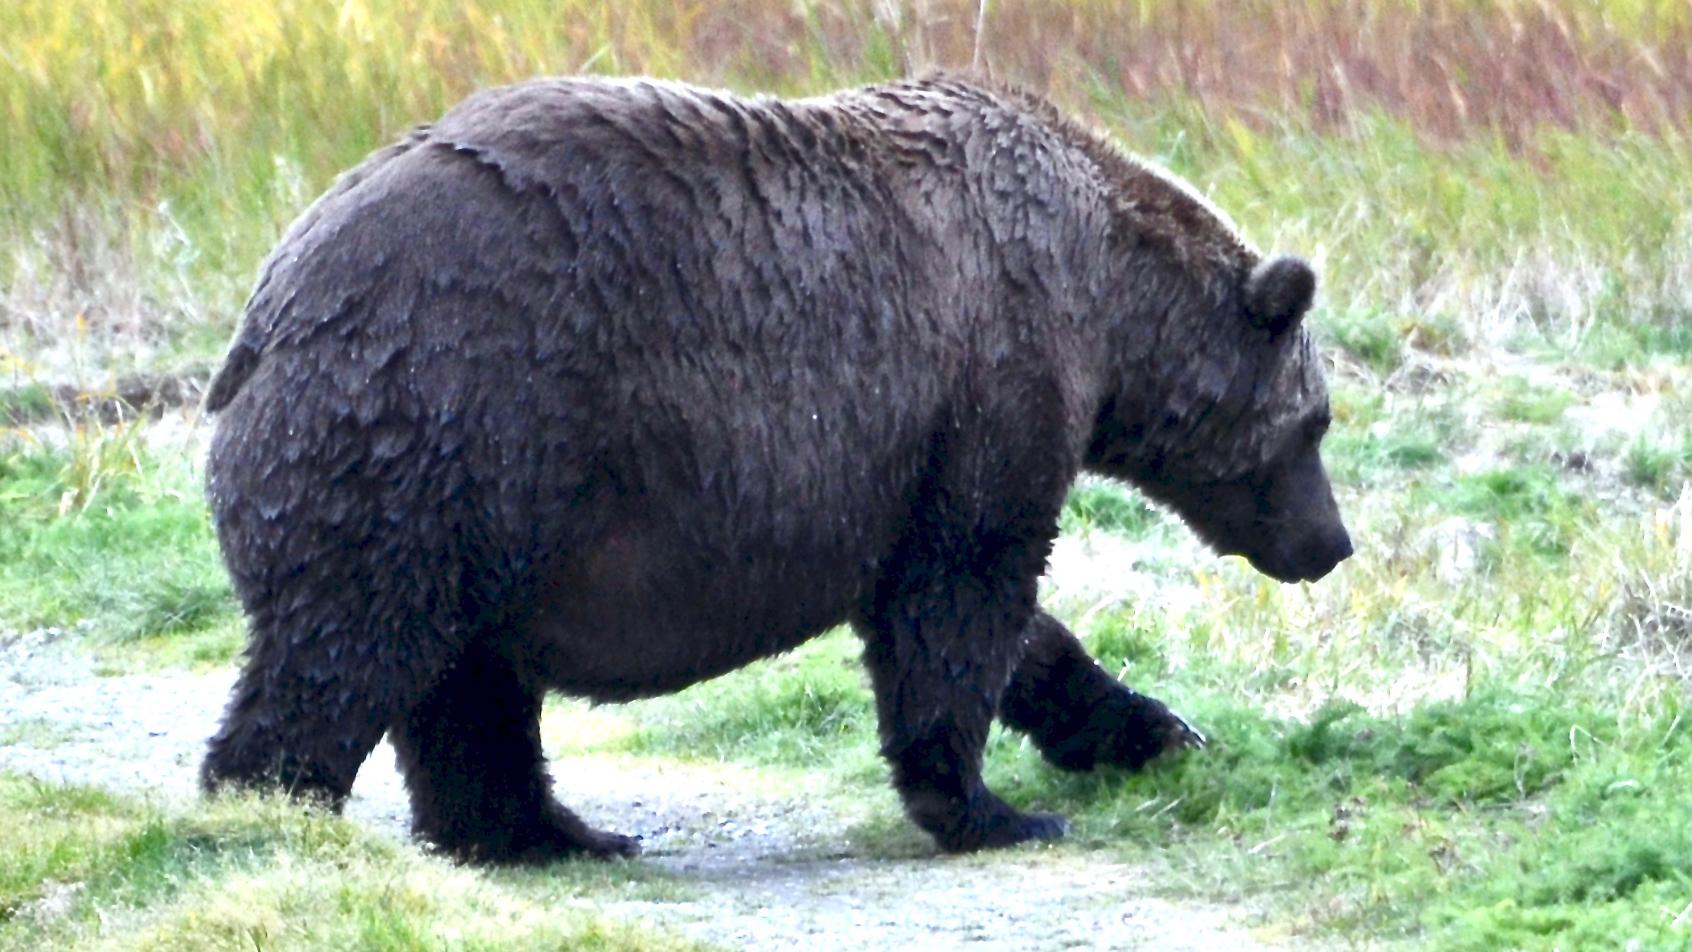 It is time to vote for the chonkiest bearin Katmai Nationwide Park TgozXDDXNnQmrFXA7whiUa